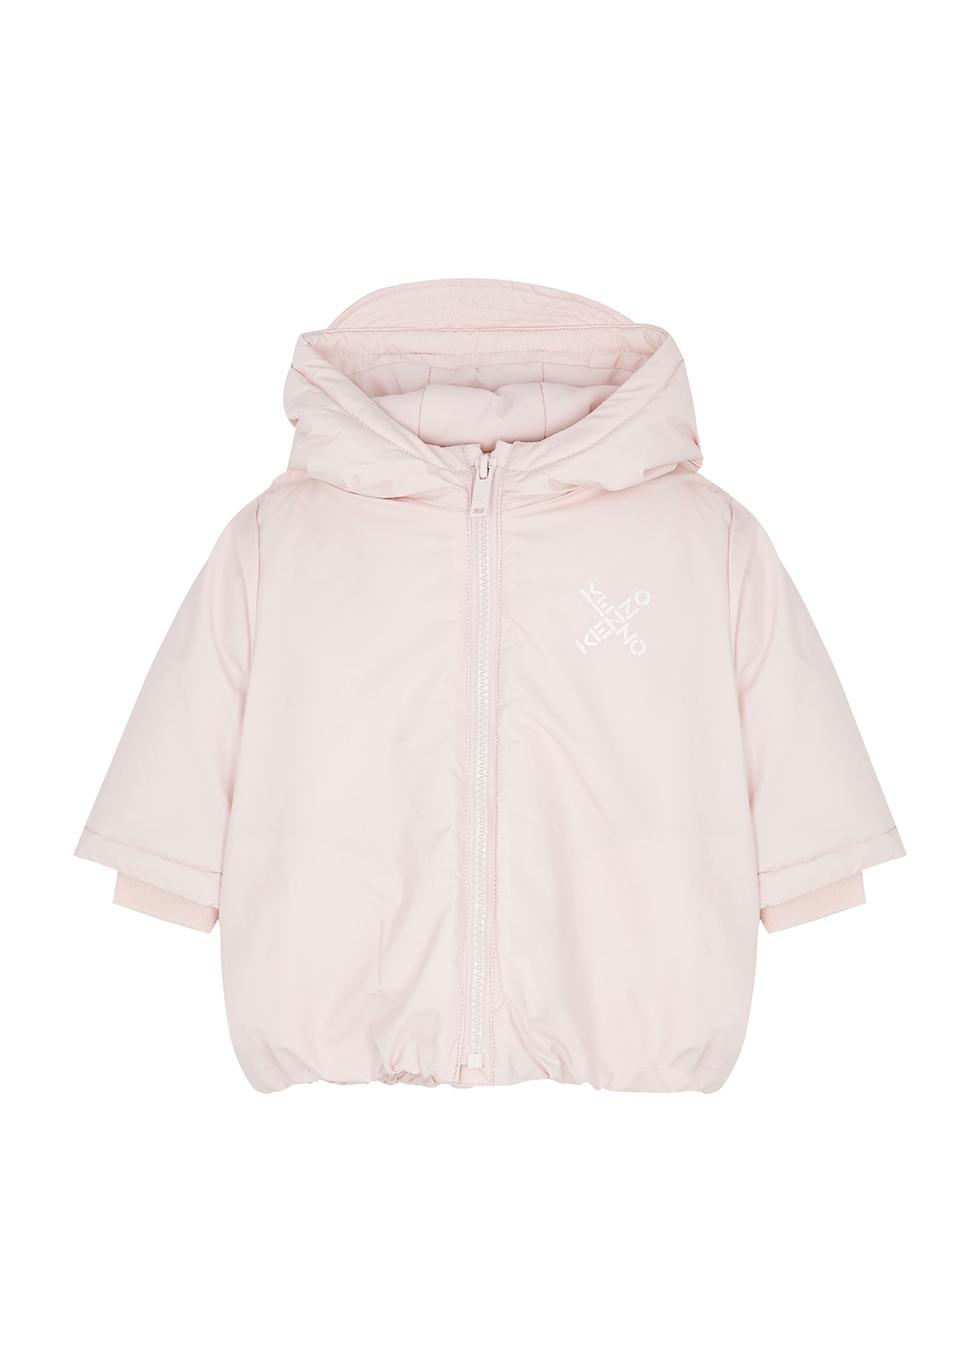 Pink padded shell jacket